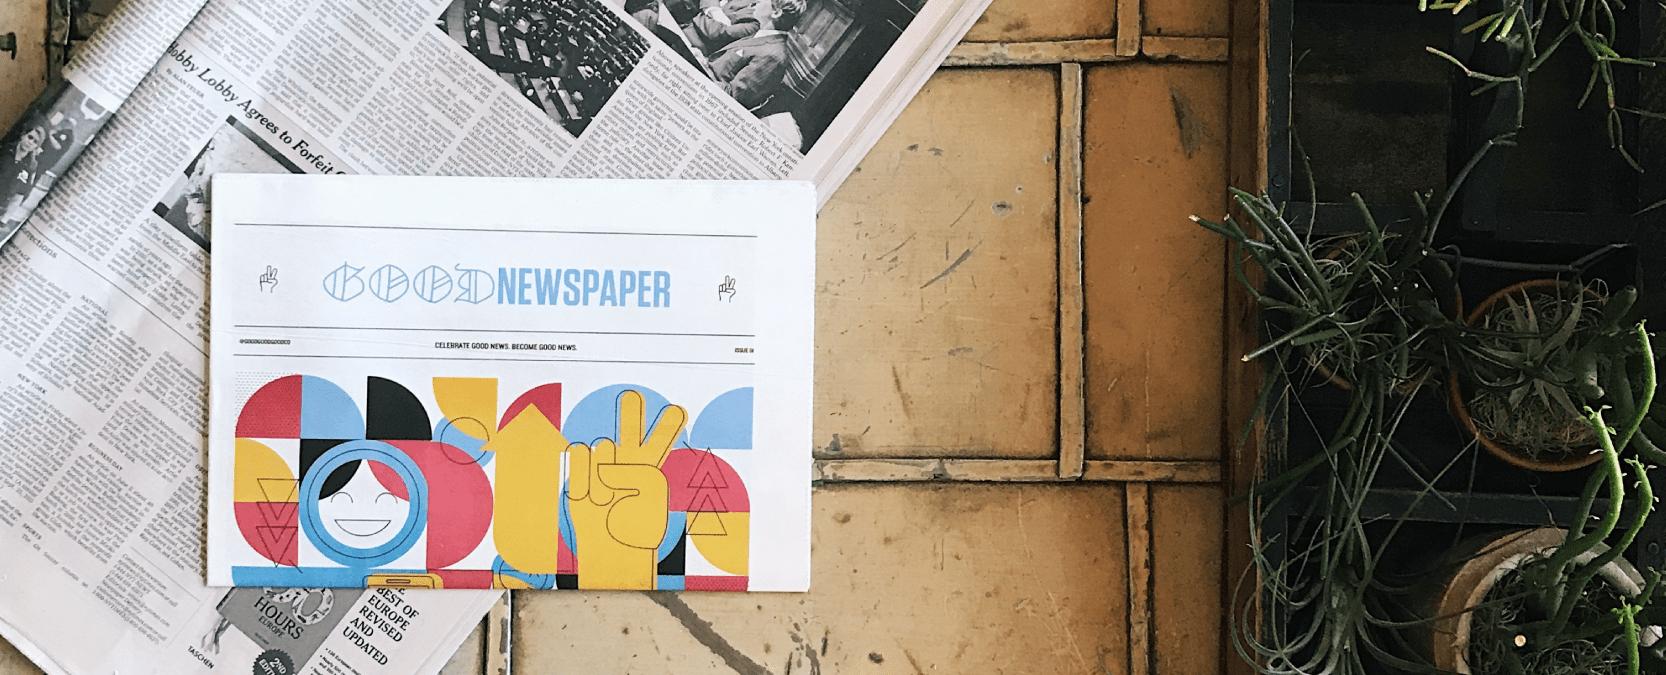 This November's Top Social Media Industry News